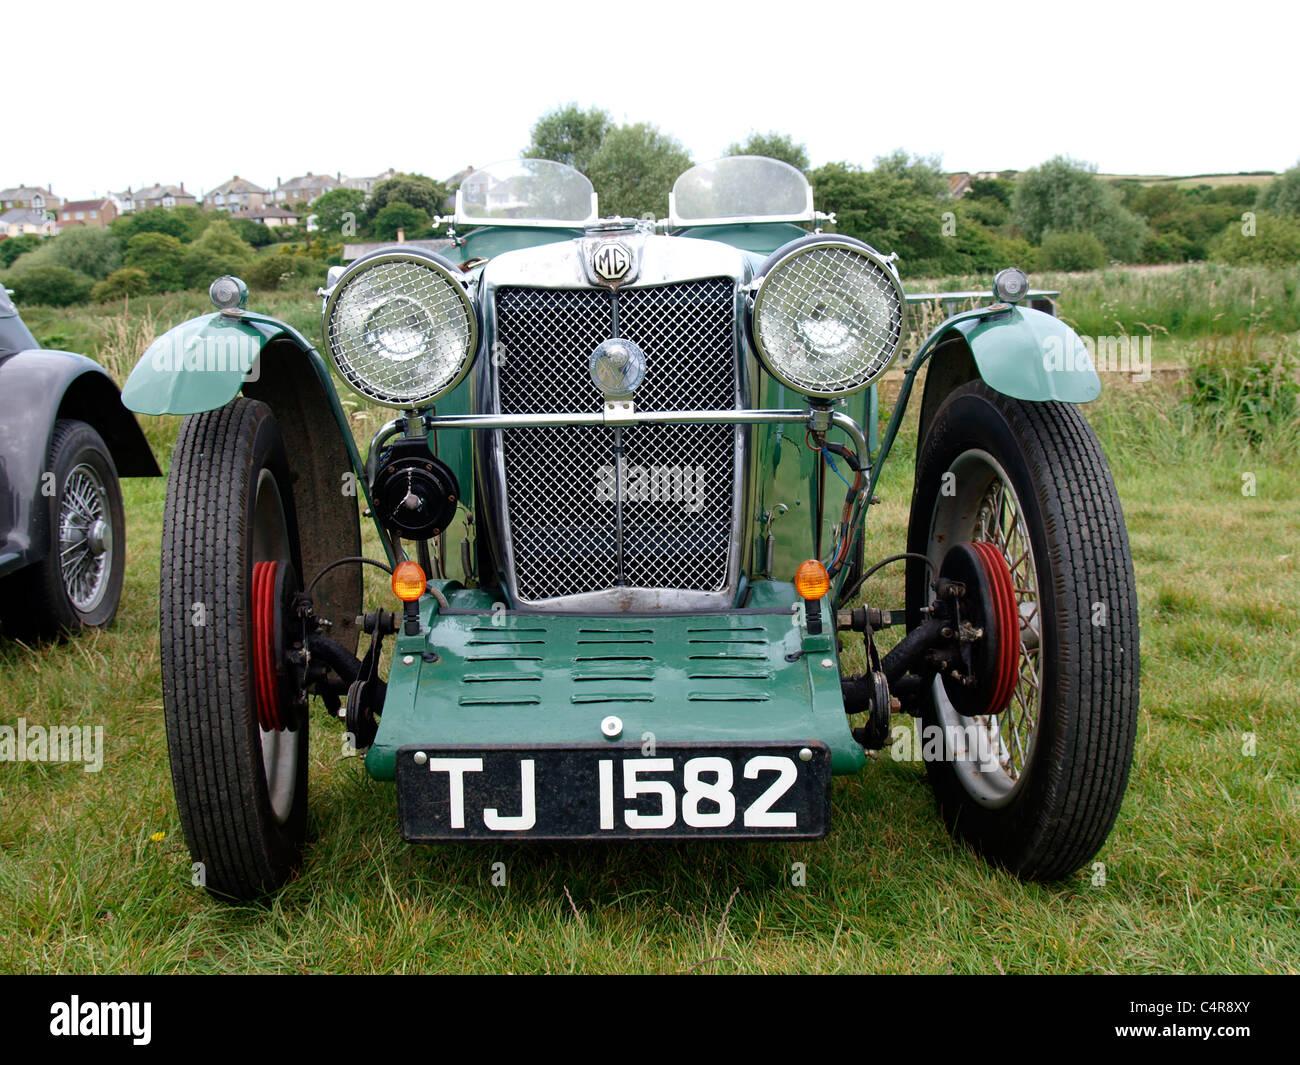 Vintage MG Midget J2, Bude car show, Cornwall, UK - Stock Image